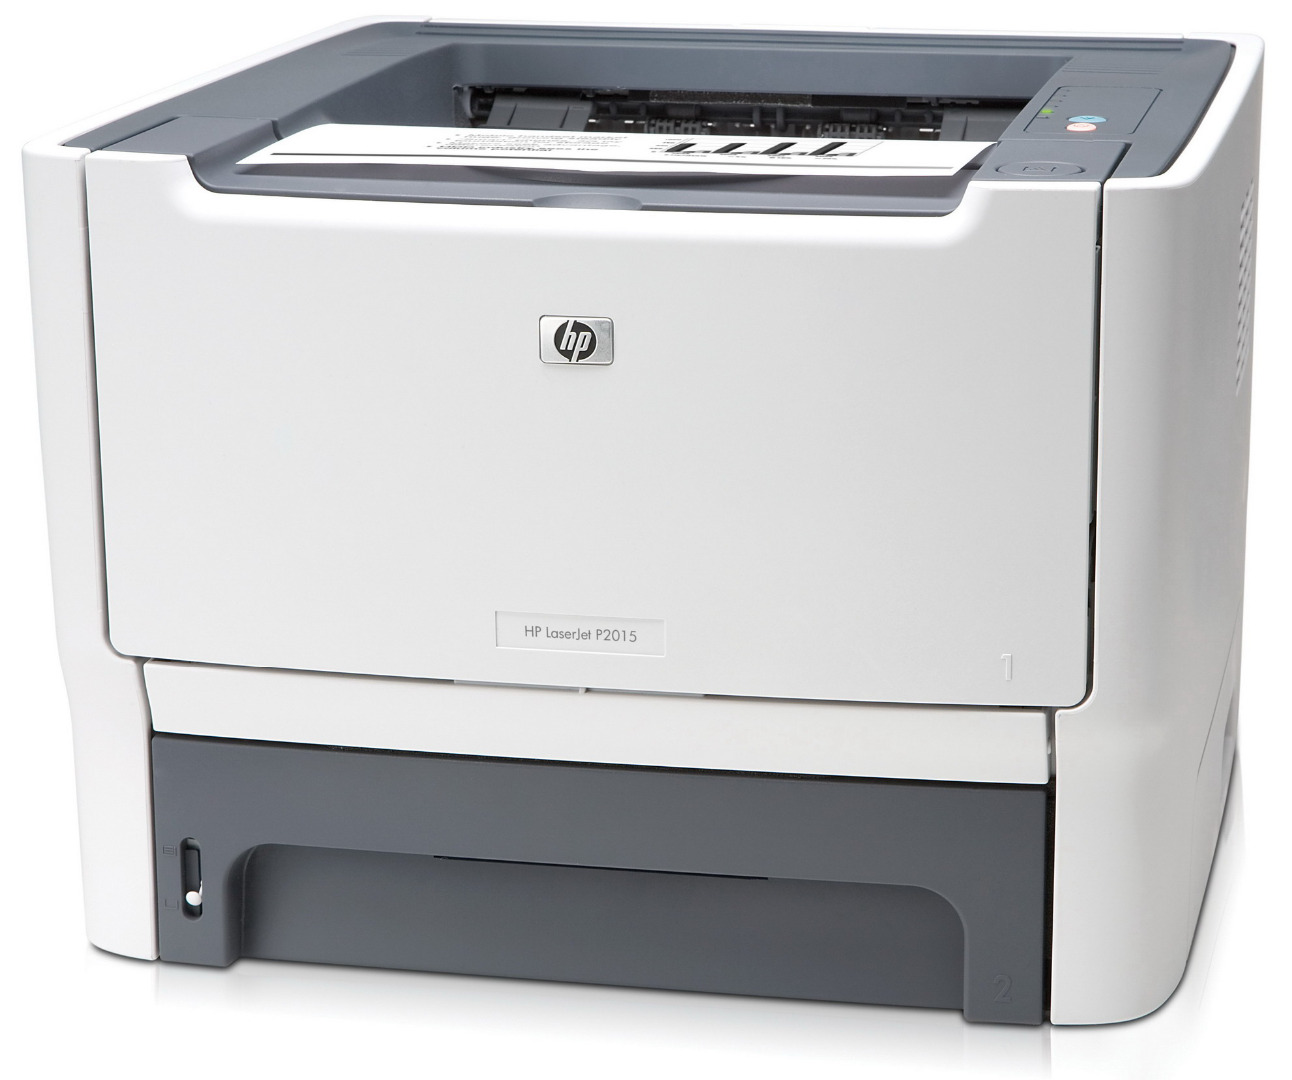 Принтер HP LaserJet P2015 Printer